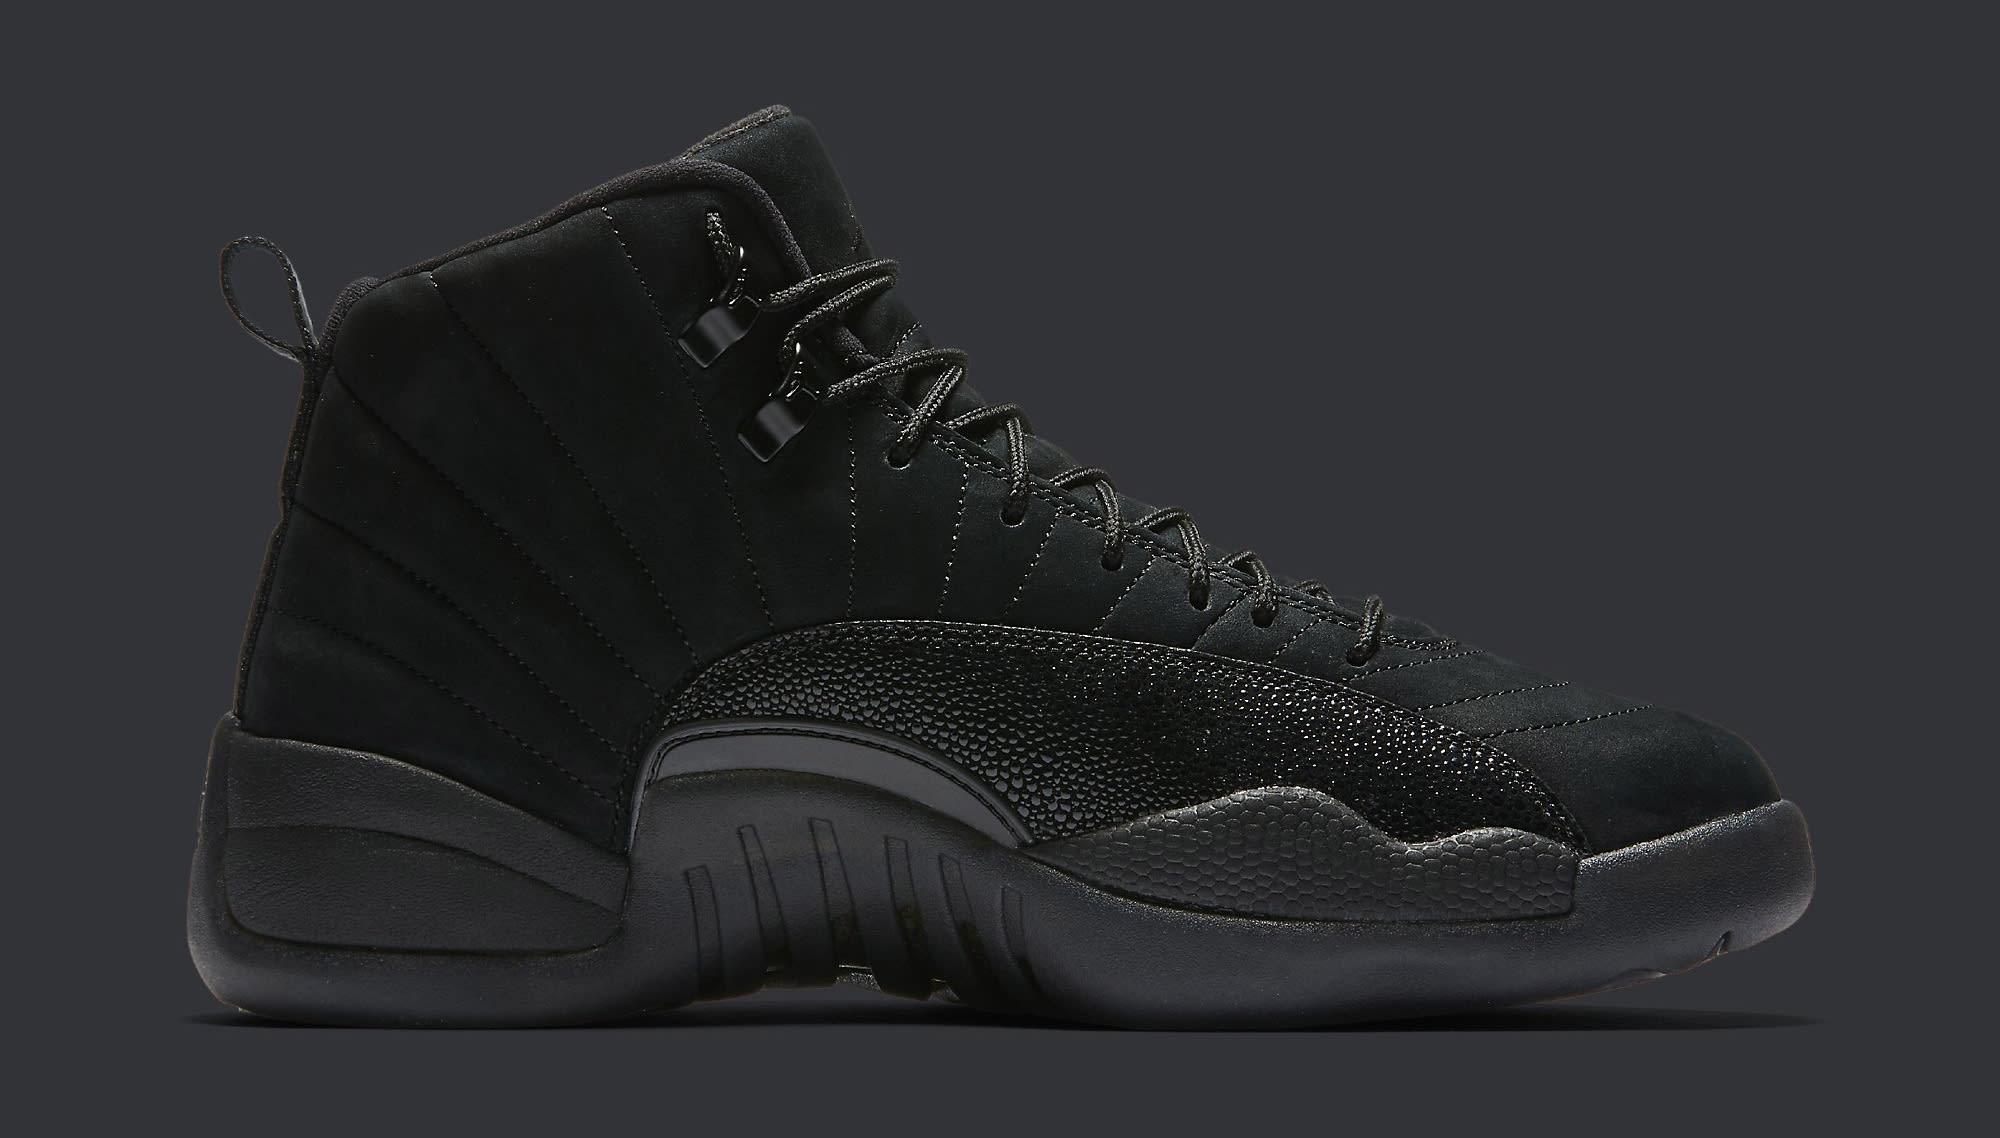 huge selection of 8a408 c0996 Image via Nike OVO Air Jordan 12 873864-032 Medial